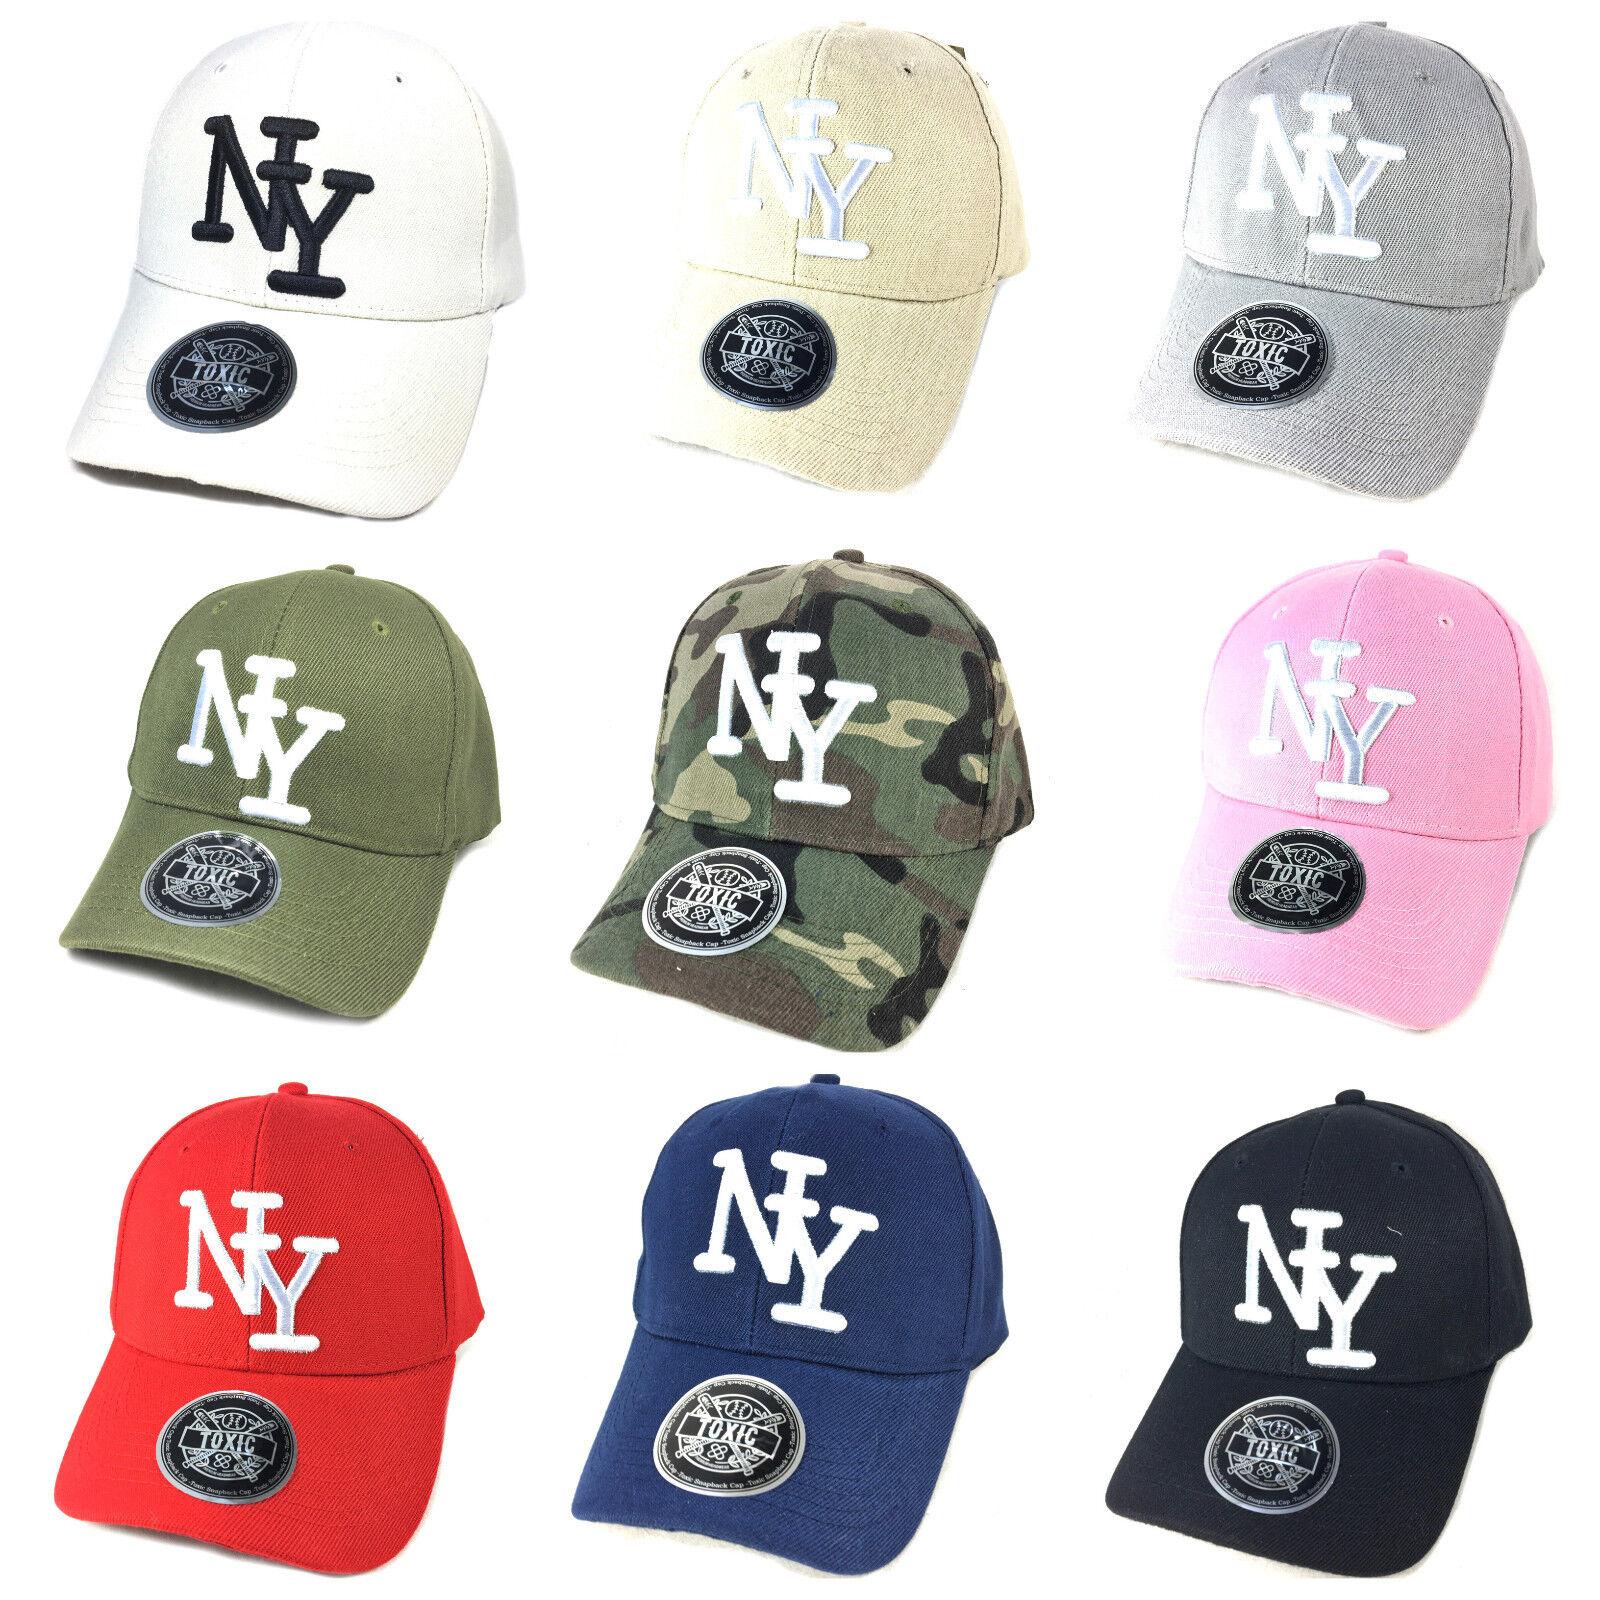 Basecap NY Baseball Cap Kappe Base Caps curved gebogener Schirm TOXIC Sommer